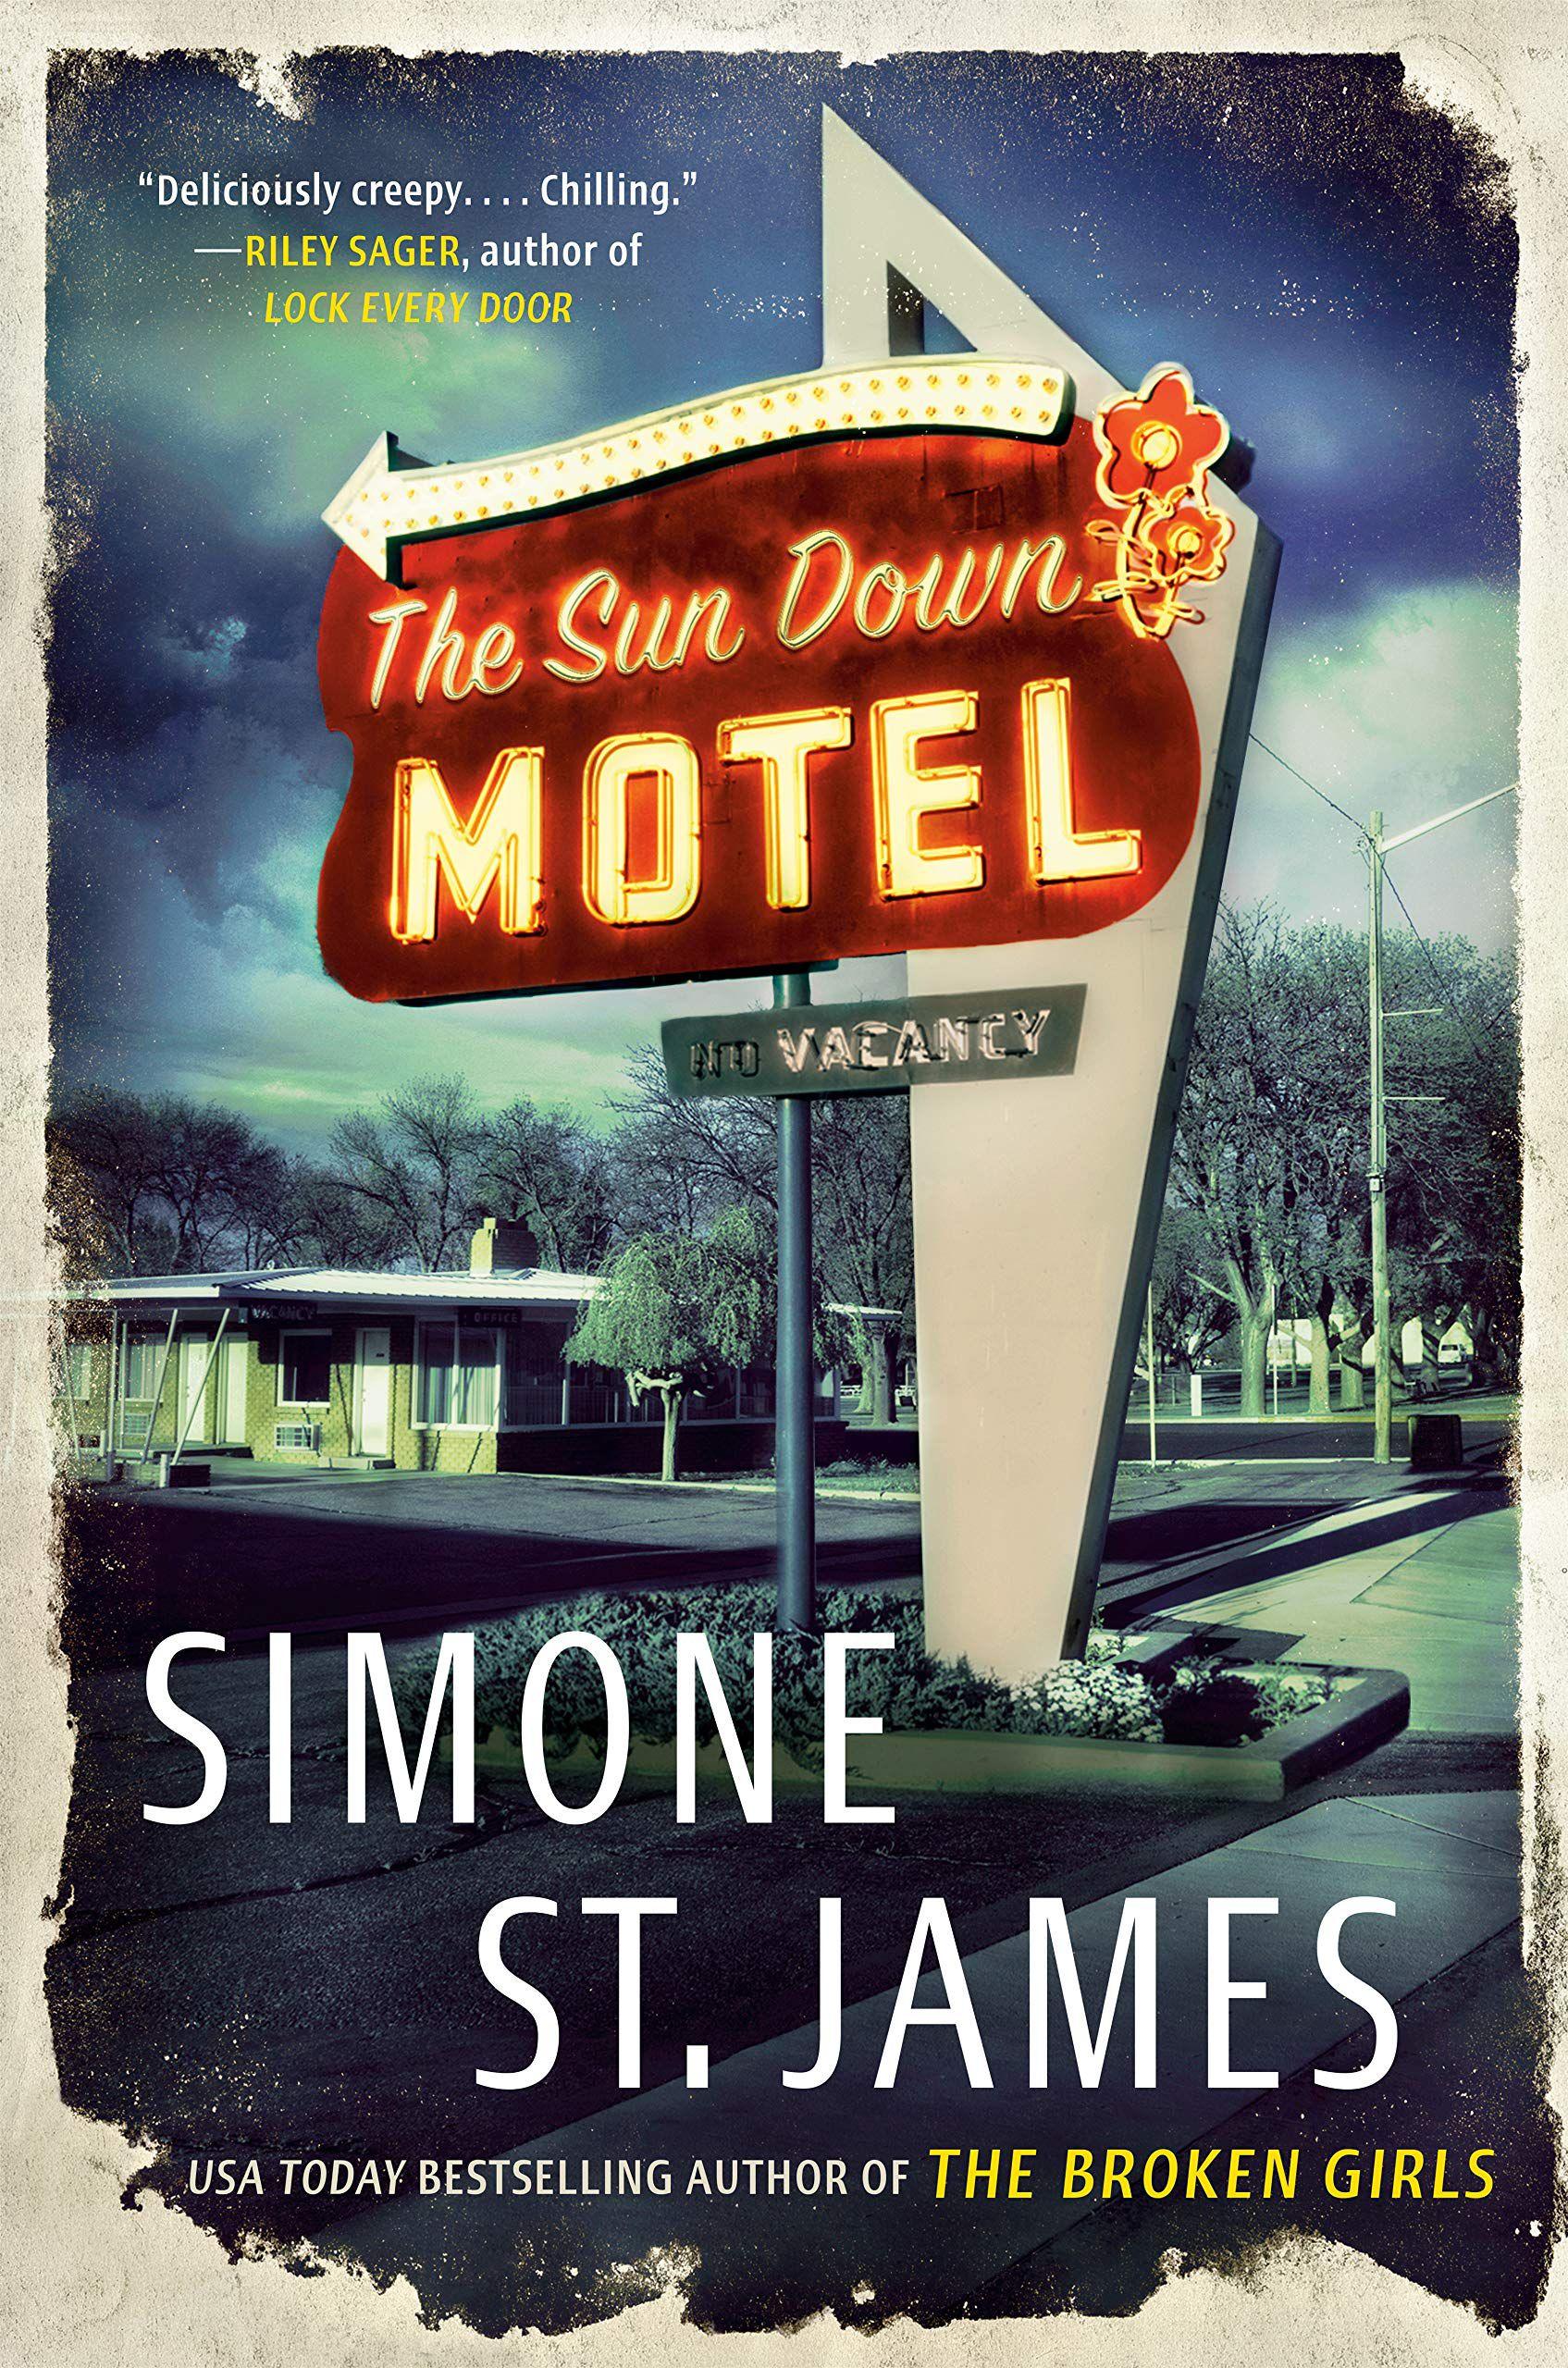 Book cover of The Sun Down Motel